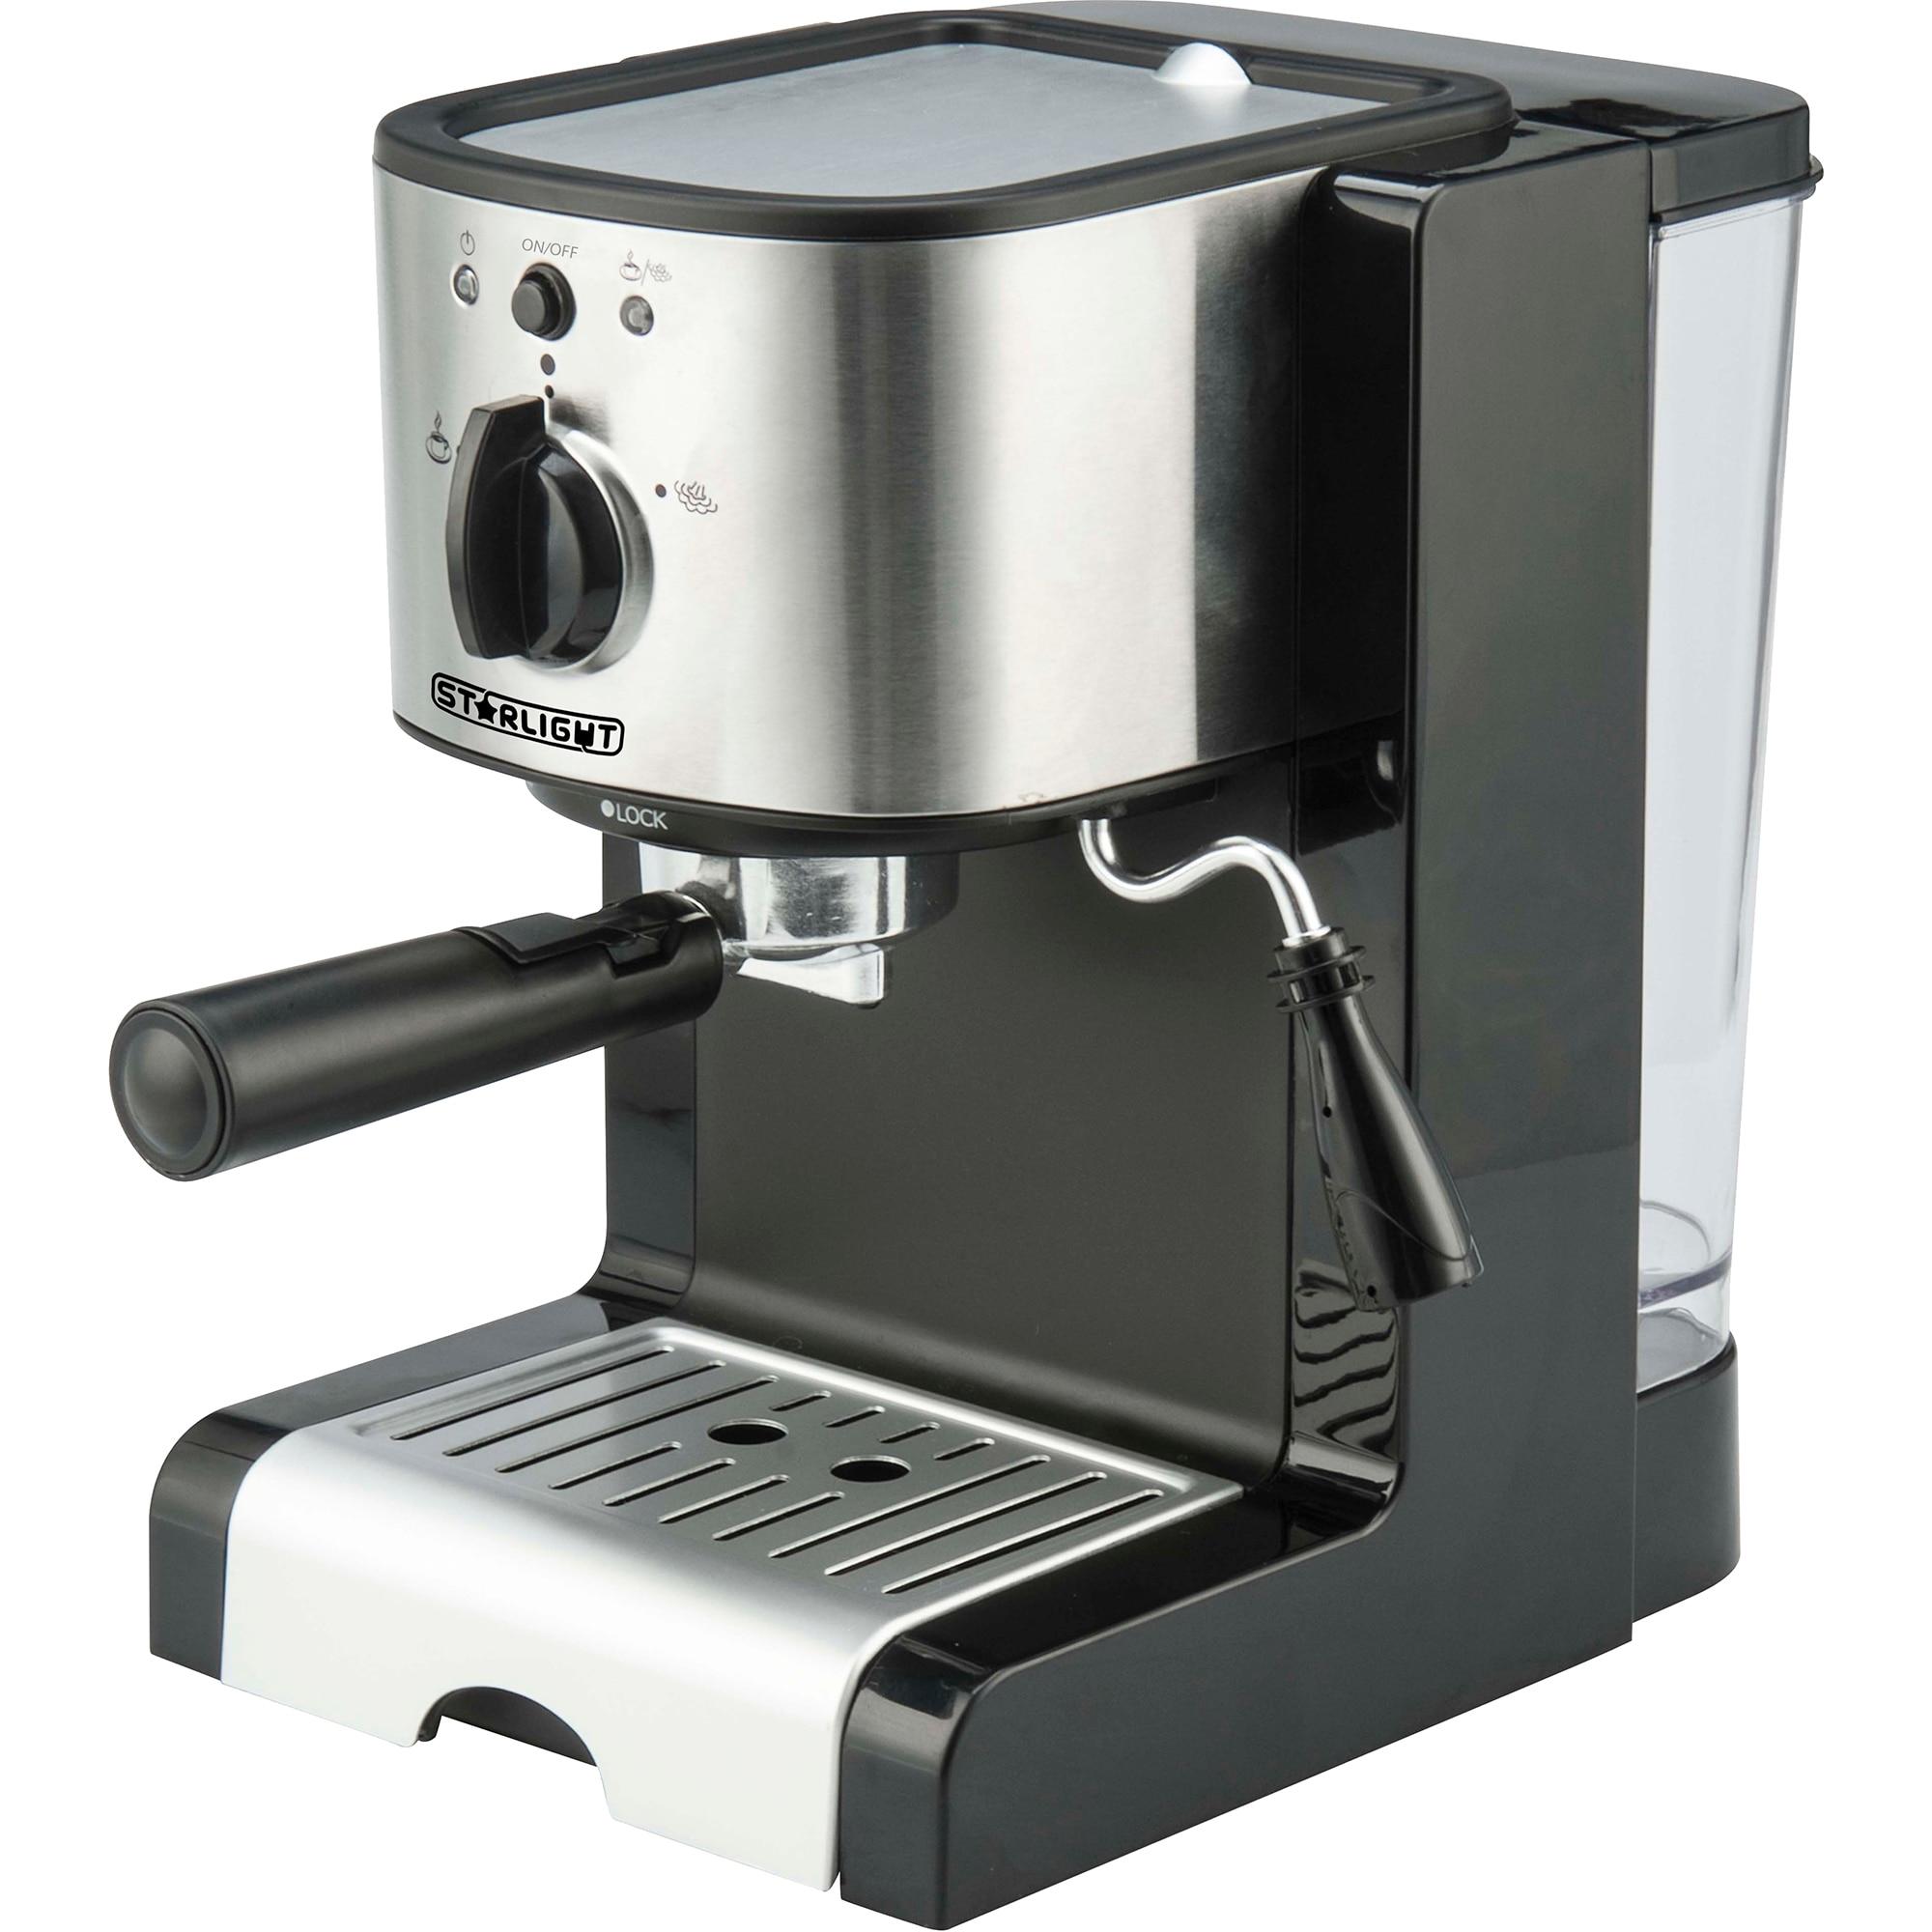 Fotografie Espressor manual Star-Light EMD-1515, 15 Bar, Dispozitiv spumare, 1.5 l, Negru/Inox